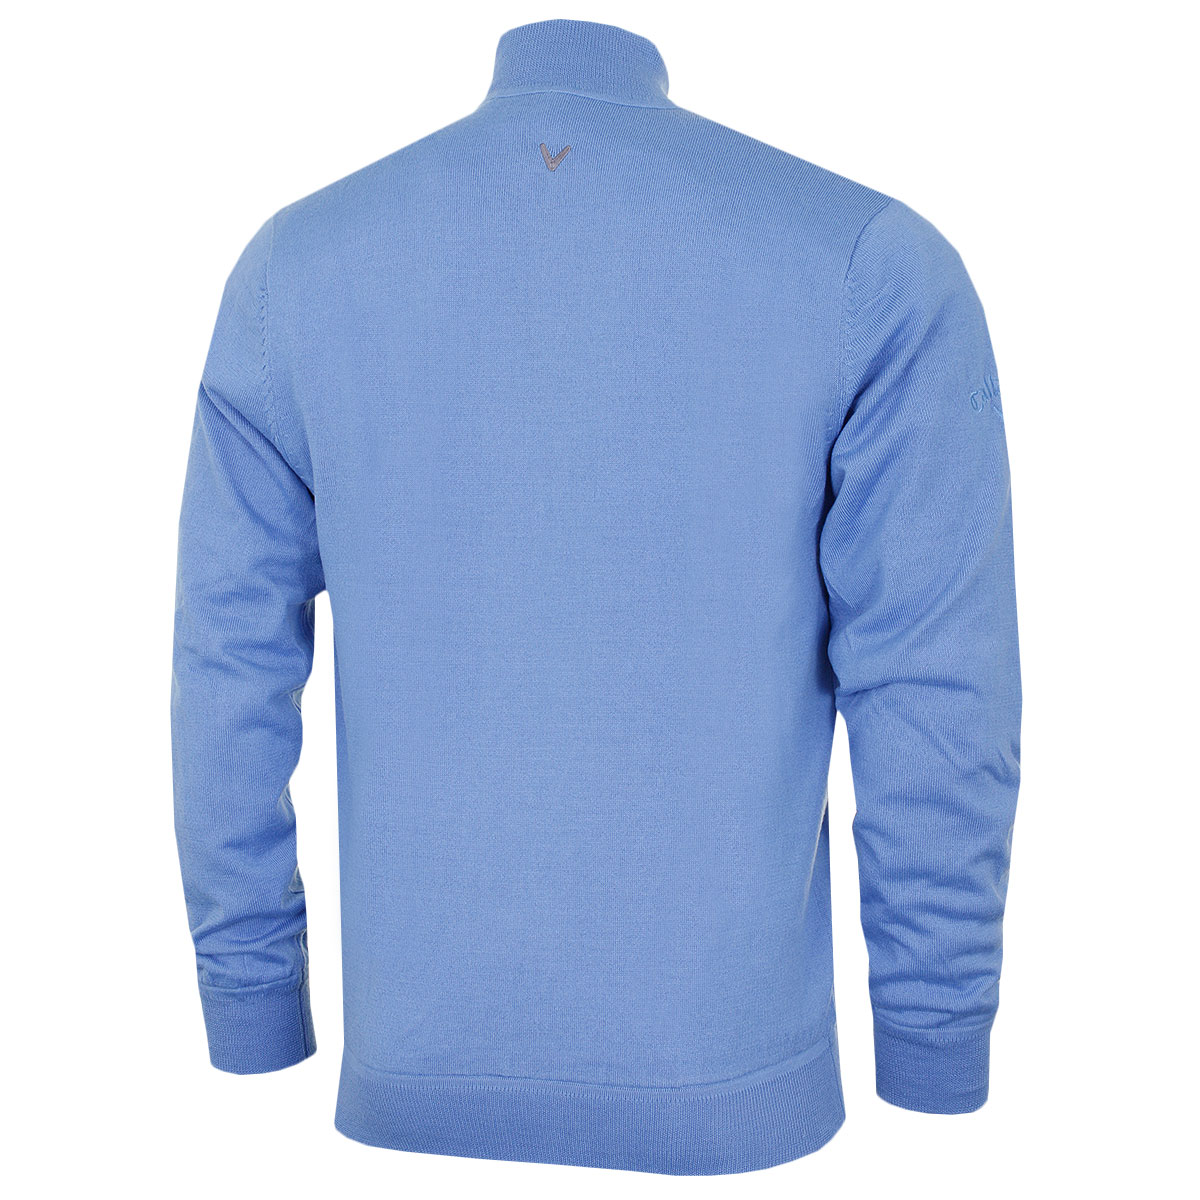 Callaway-Golf-Mens-1-4-Zip-Mock-Merino-Windproof-Sweater-Pullover-49-OFF-RRP thumbnail 14